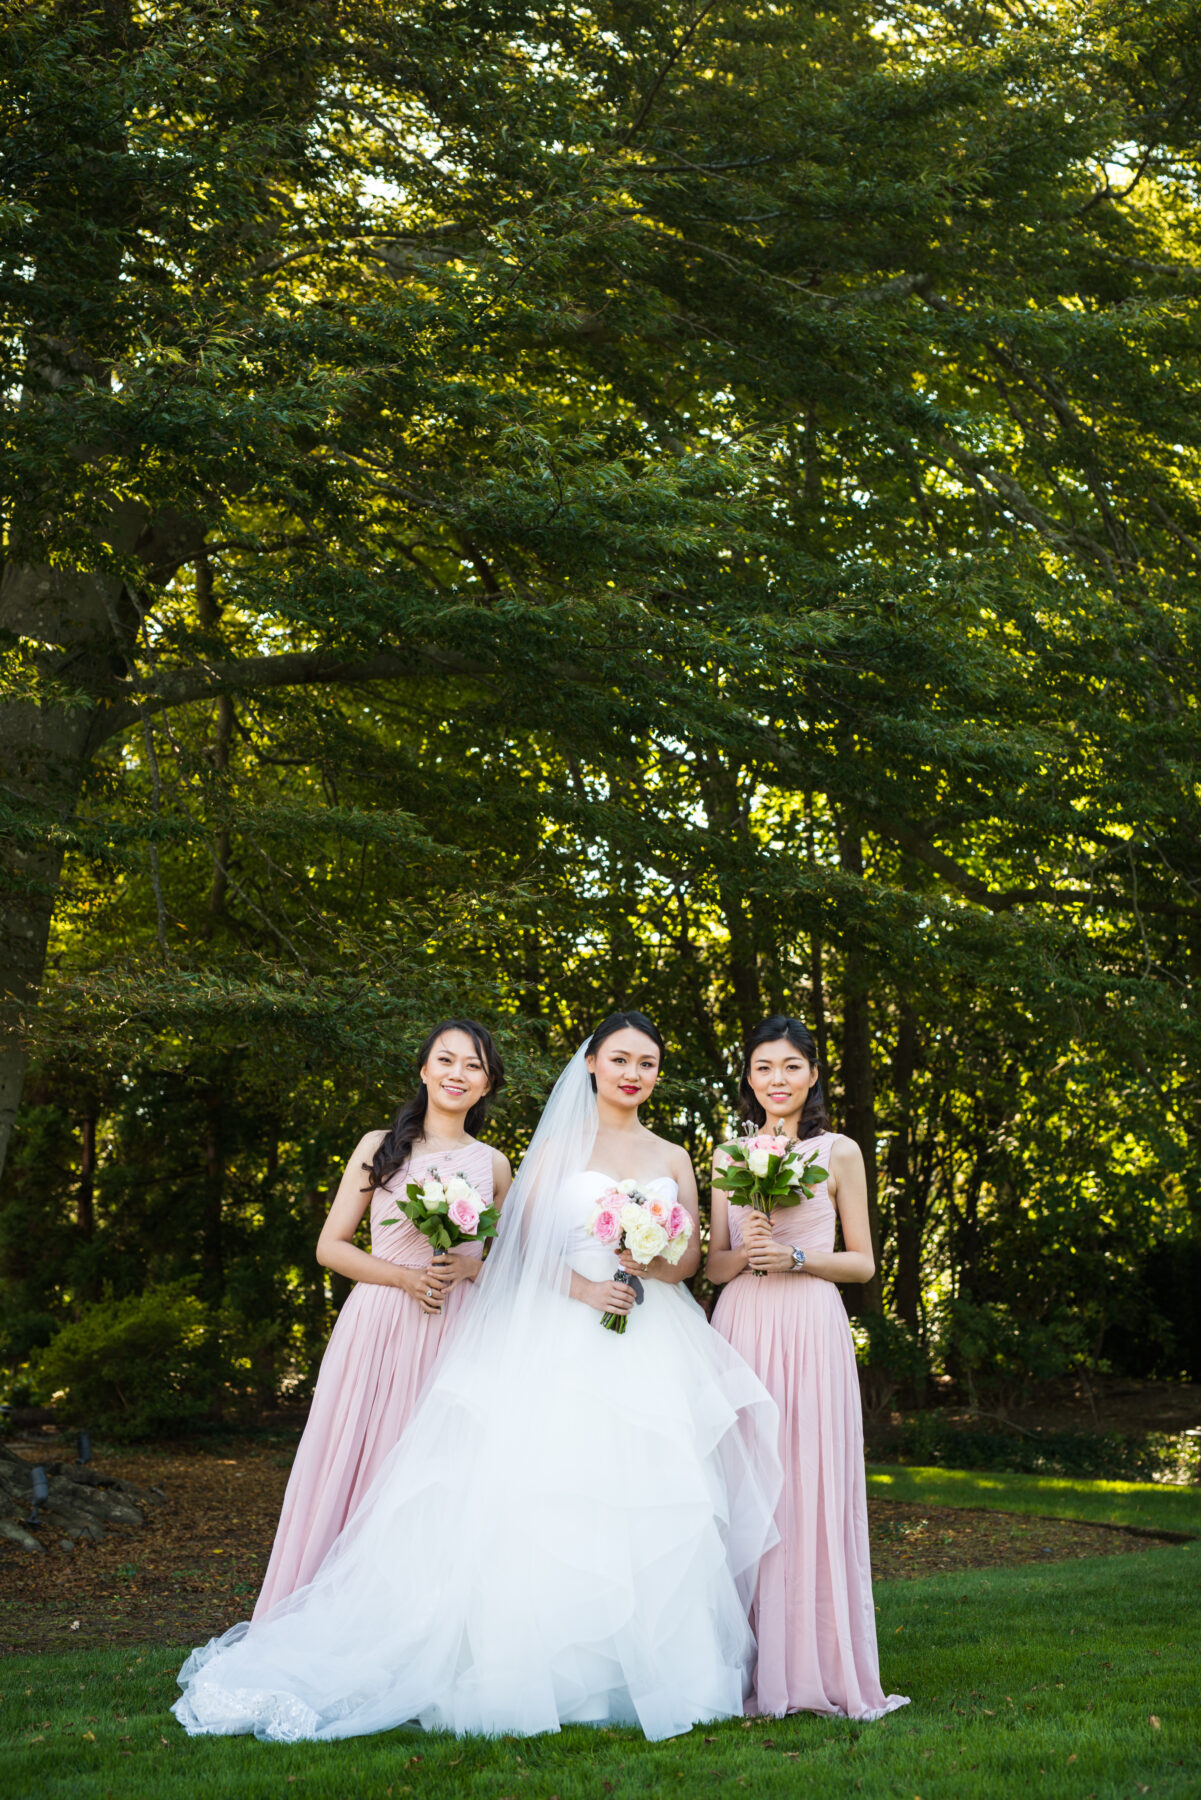 Chanler Newport Wedding Jie and Ahbishek Blueflash Photography 12